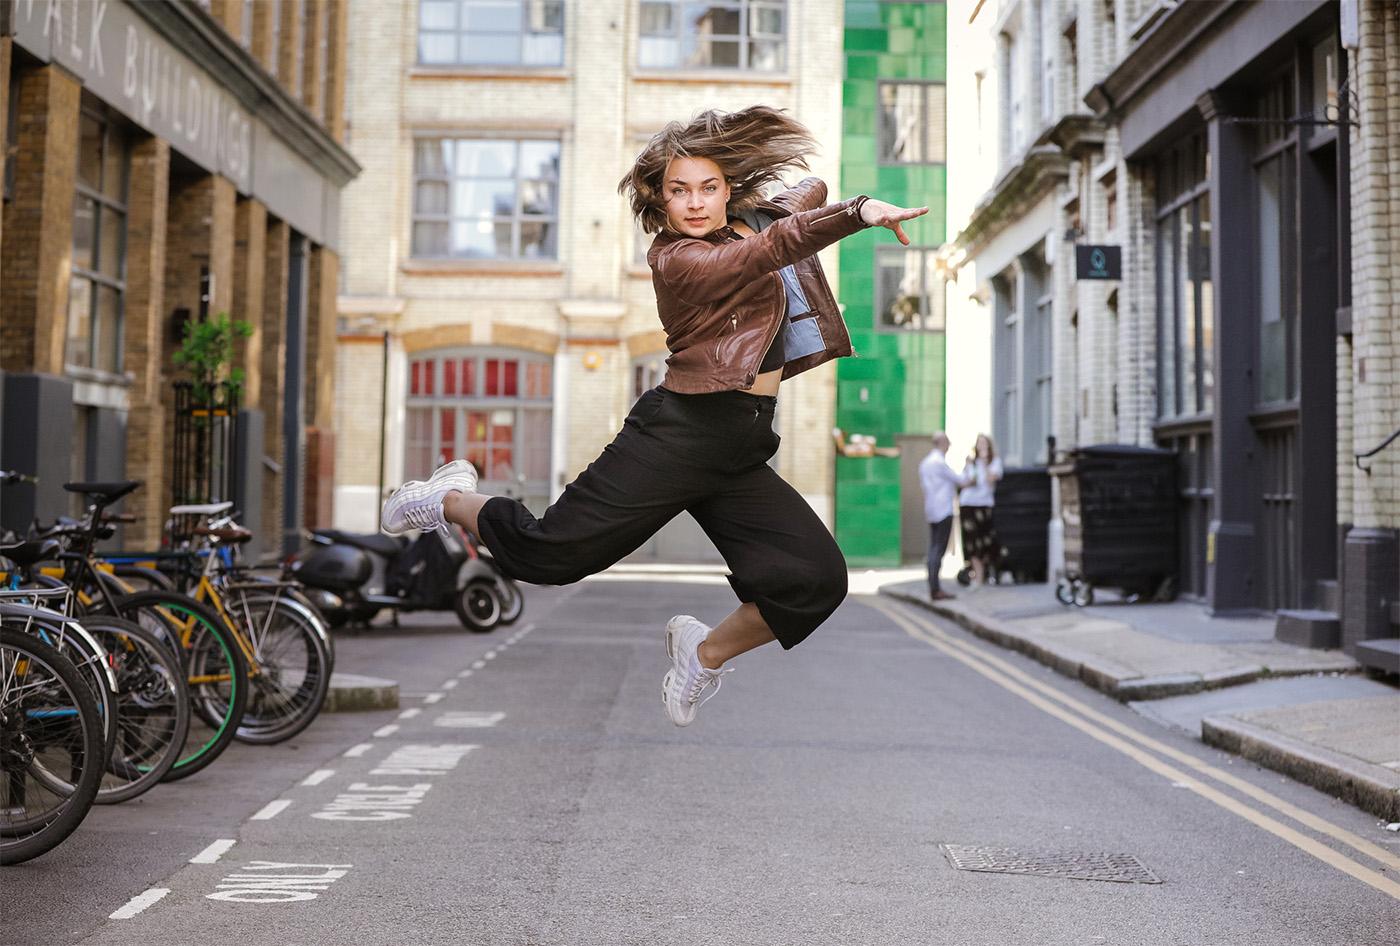 fotograf in london buchen London mal im Sprungbildmodus